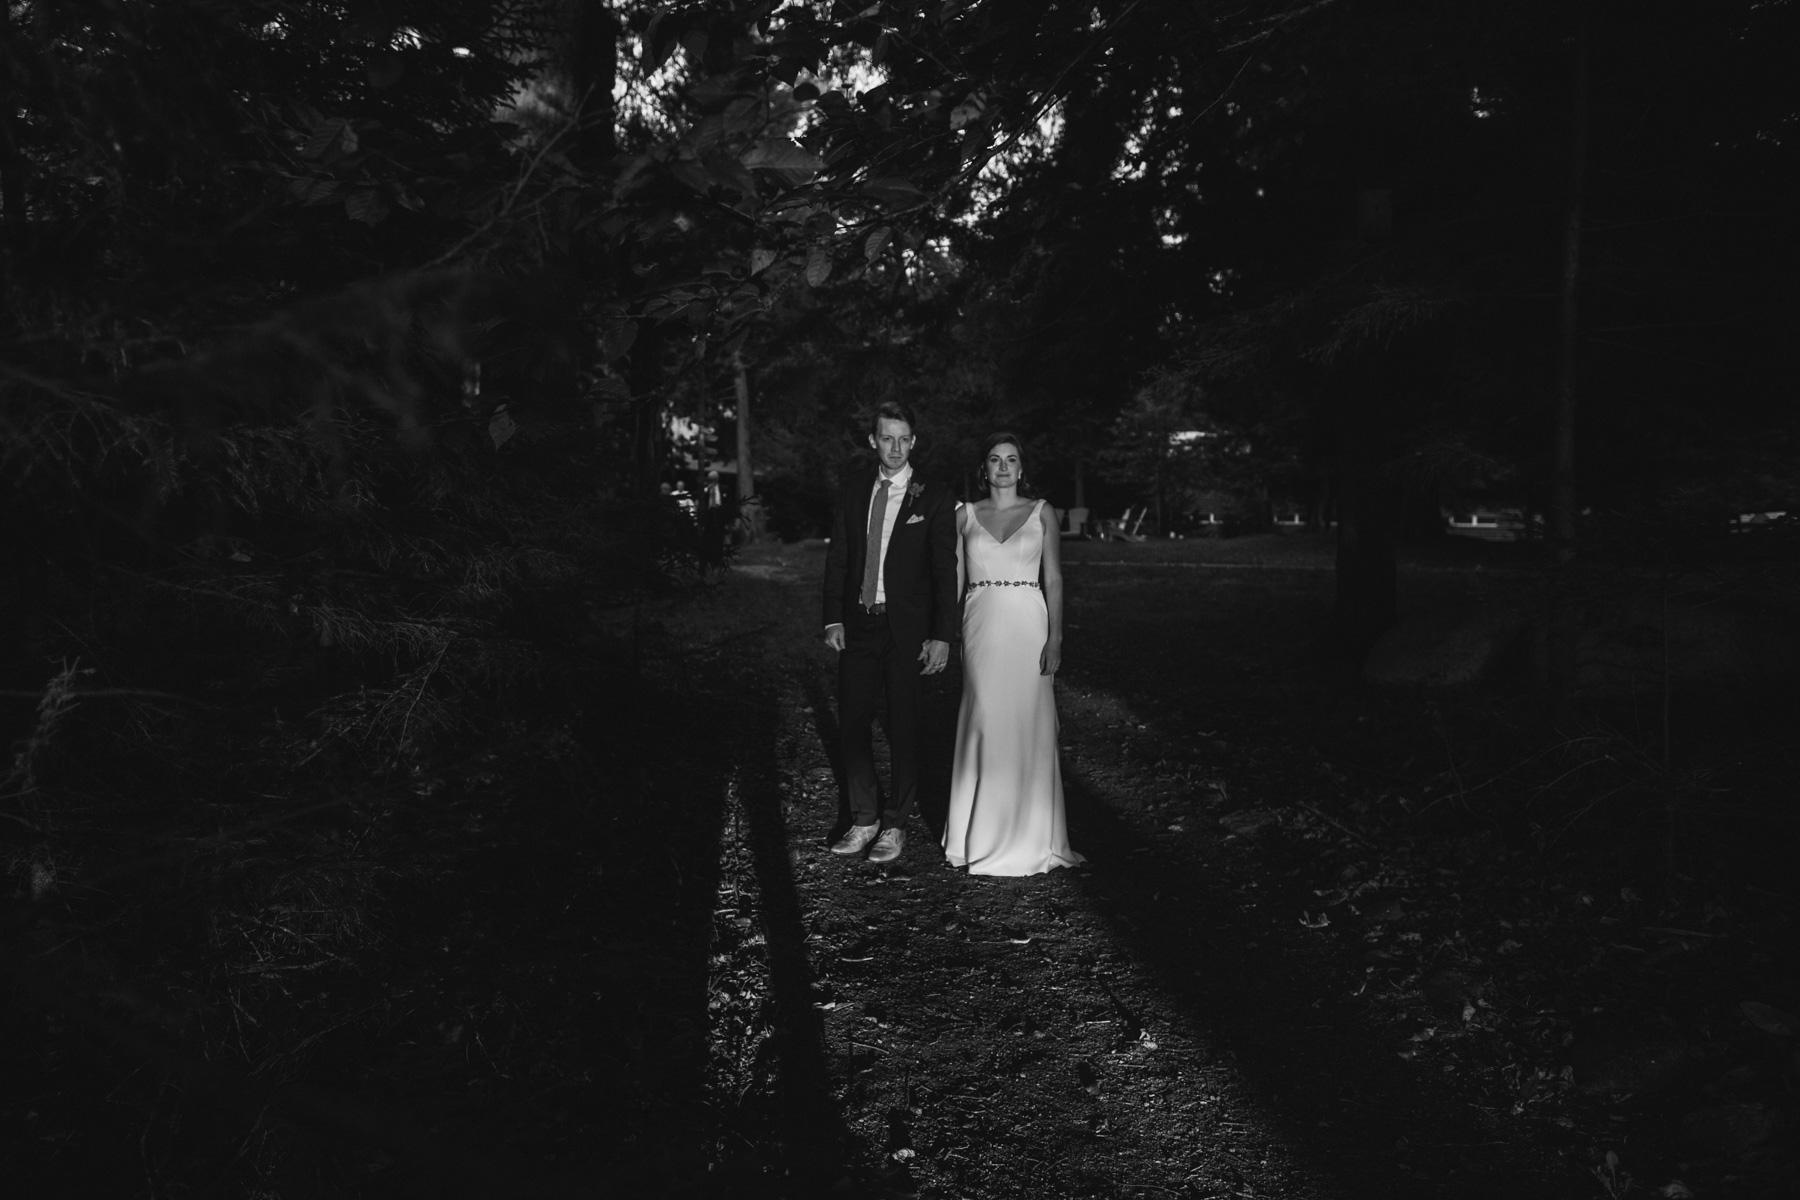 Wedding-Photography-Campground-21.jpg